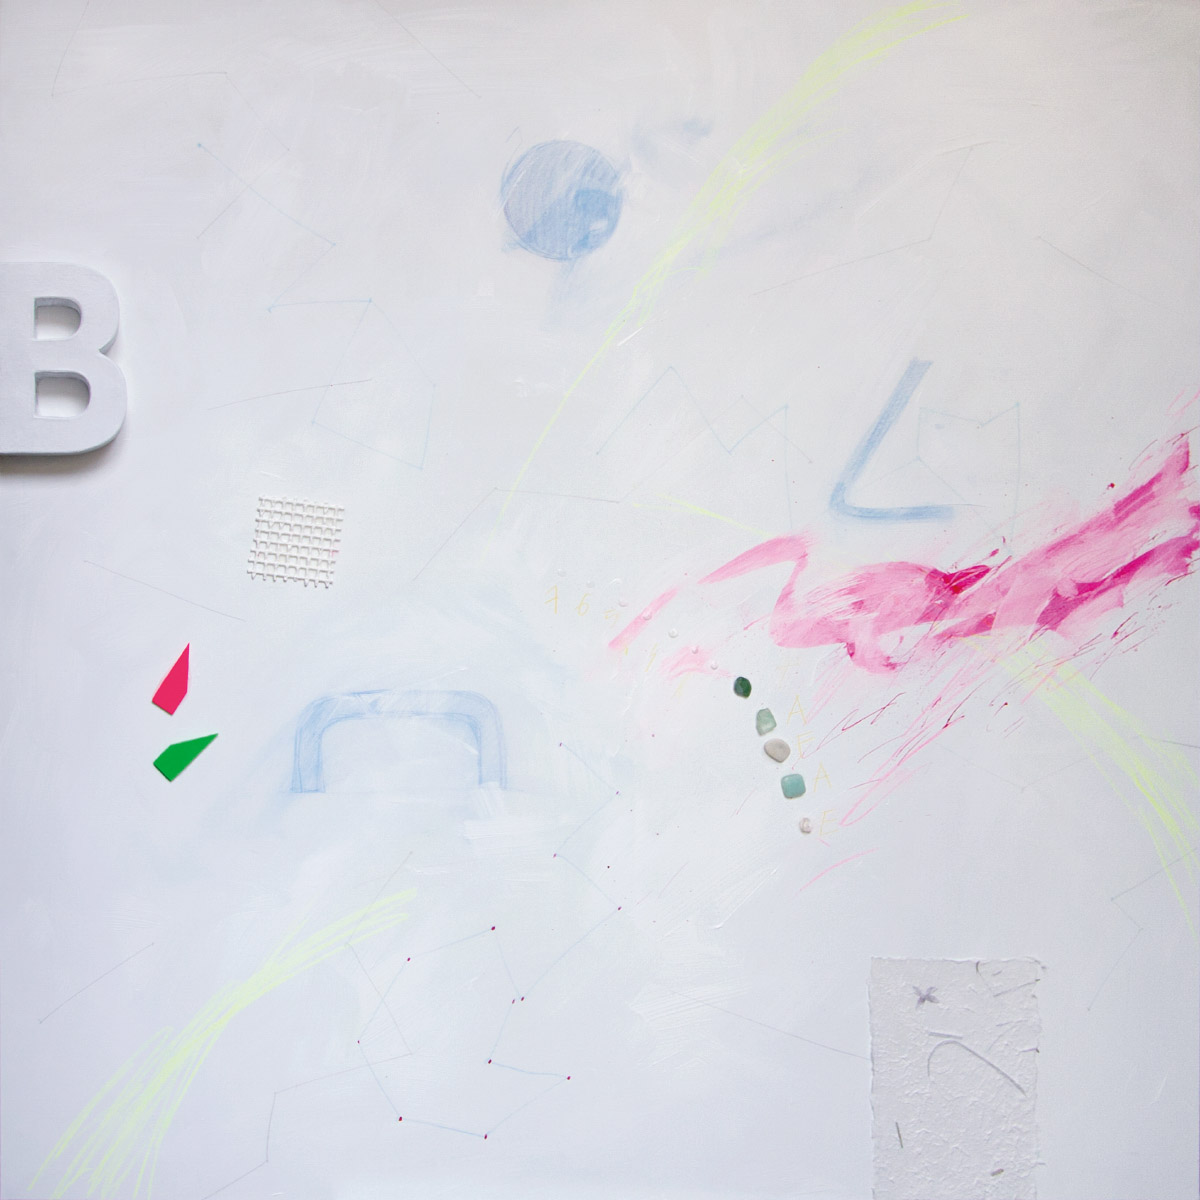 Spacevisual 13, 2015, acrylic, stones, wire, paper, graphite on canvas, 100x100 cm